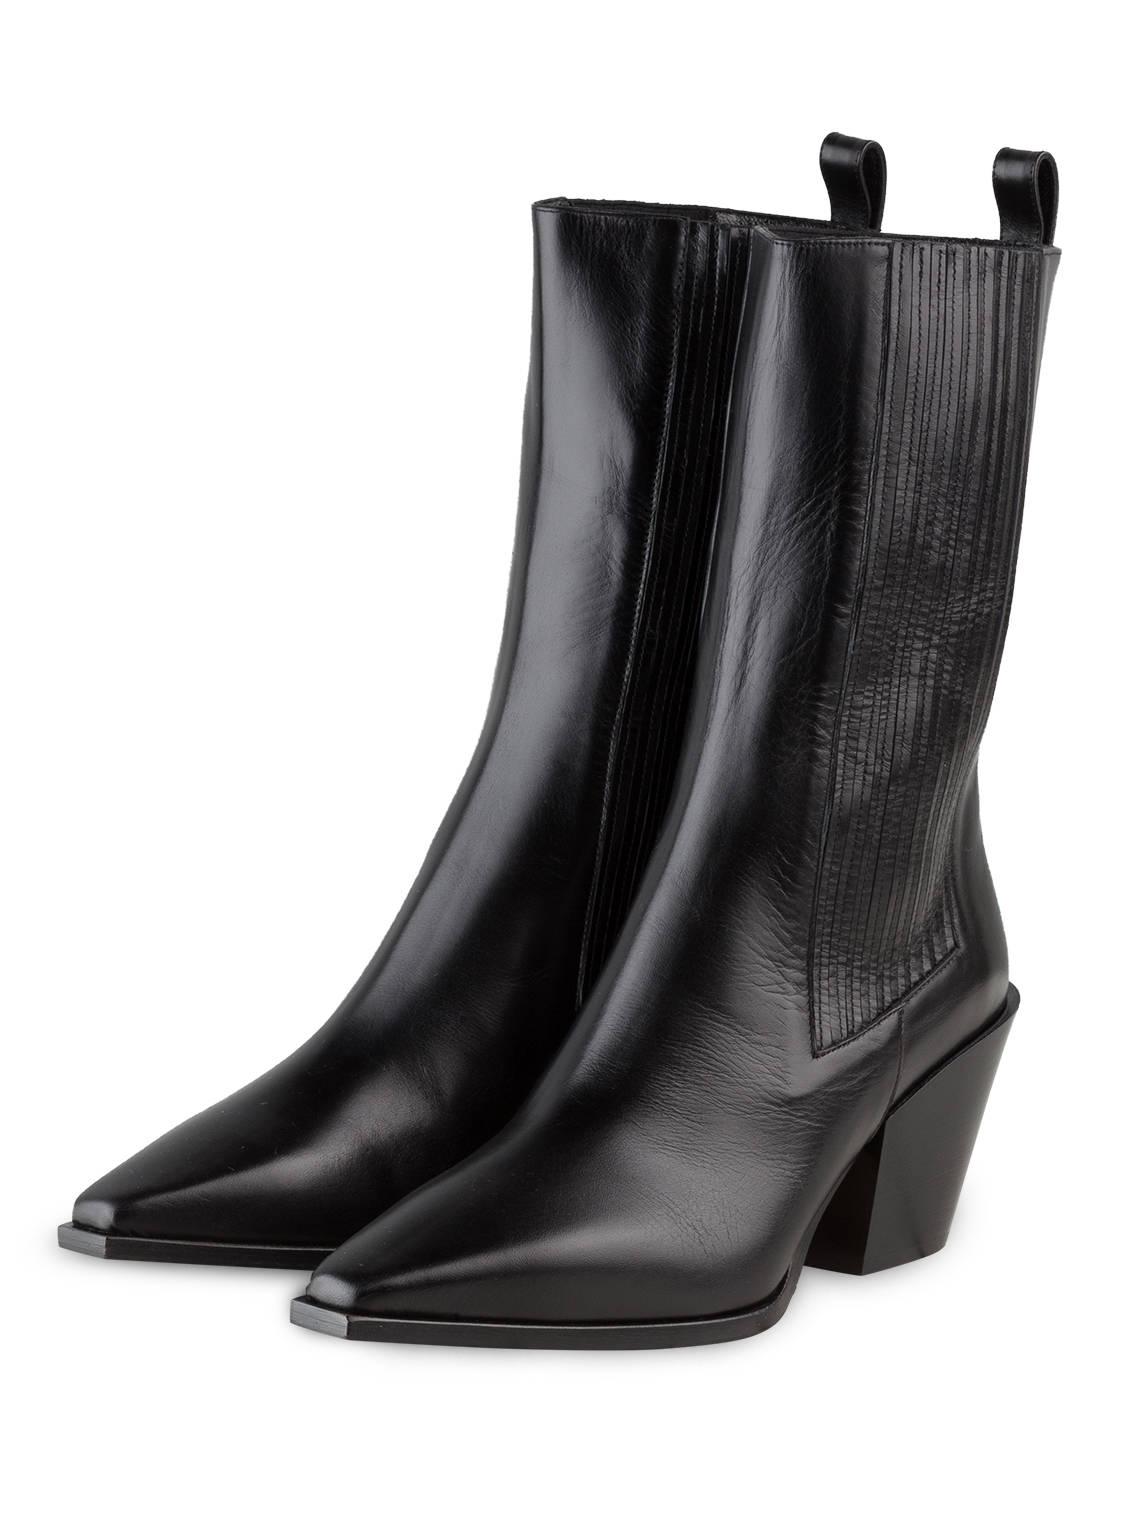 Image of Aeyde Cowboy Boots Ari schwarz